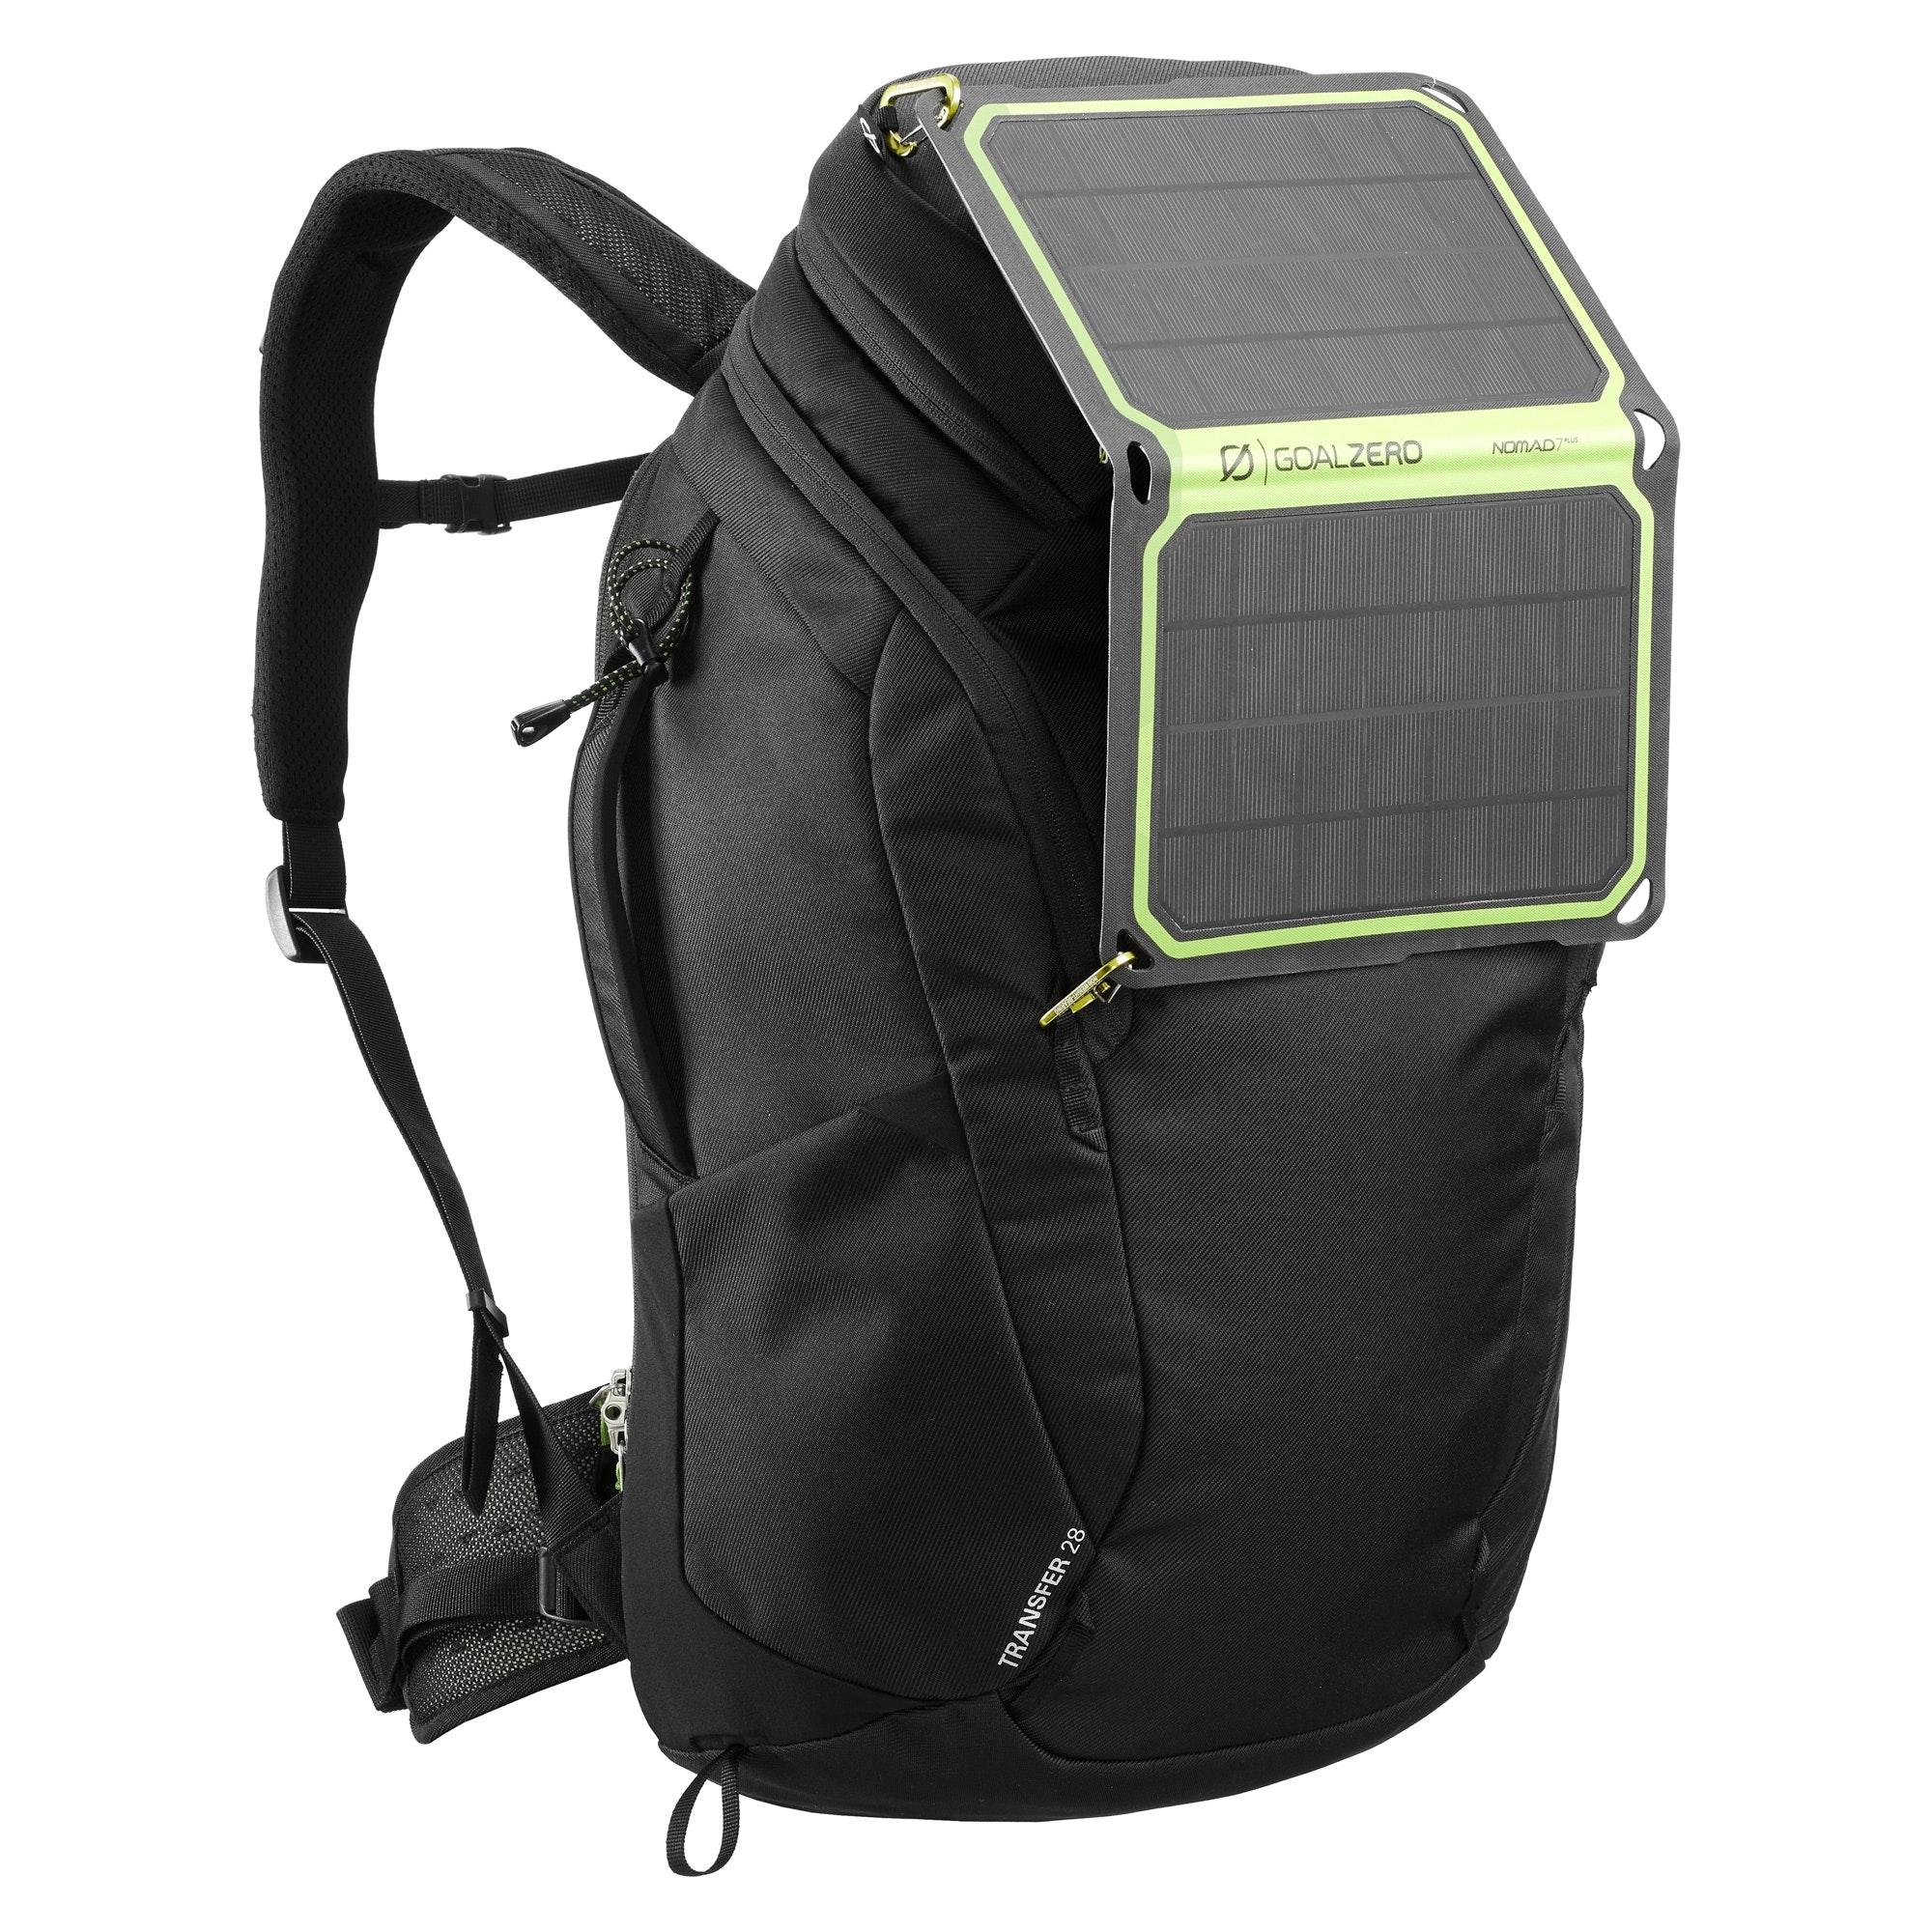 Kathmandu-Transfer-28L-Commuter-Bag-Laptop-Backpack-Rucksack-Travel-Pack-v3